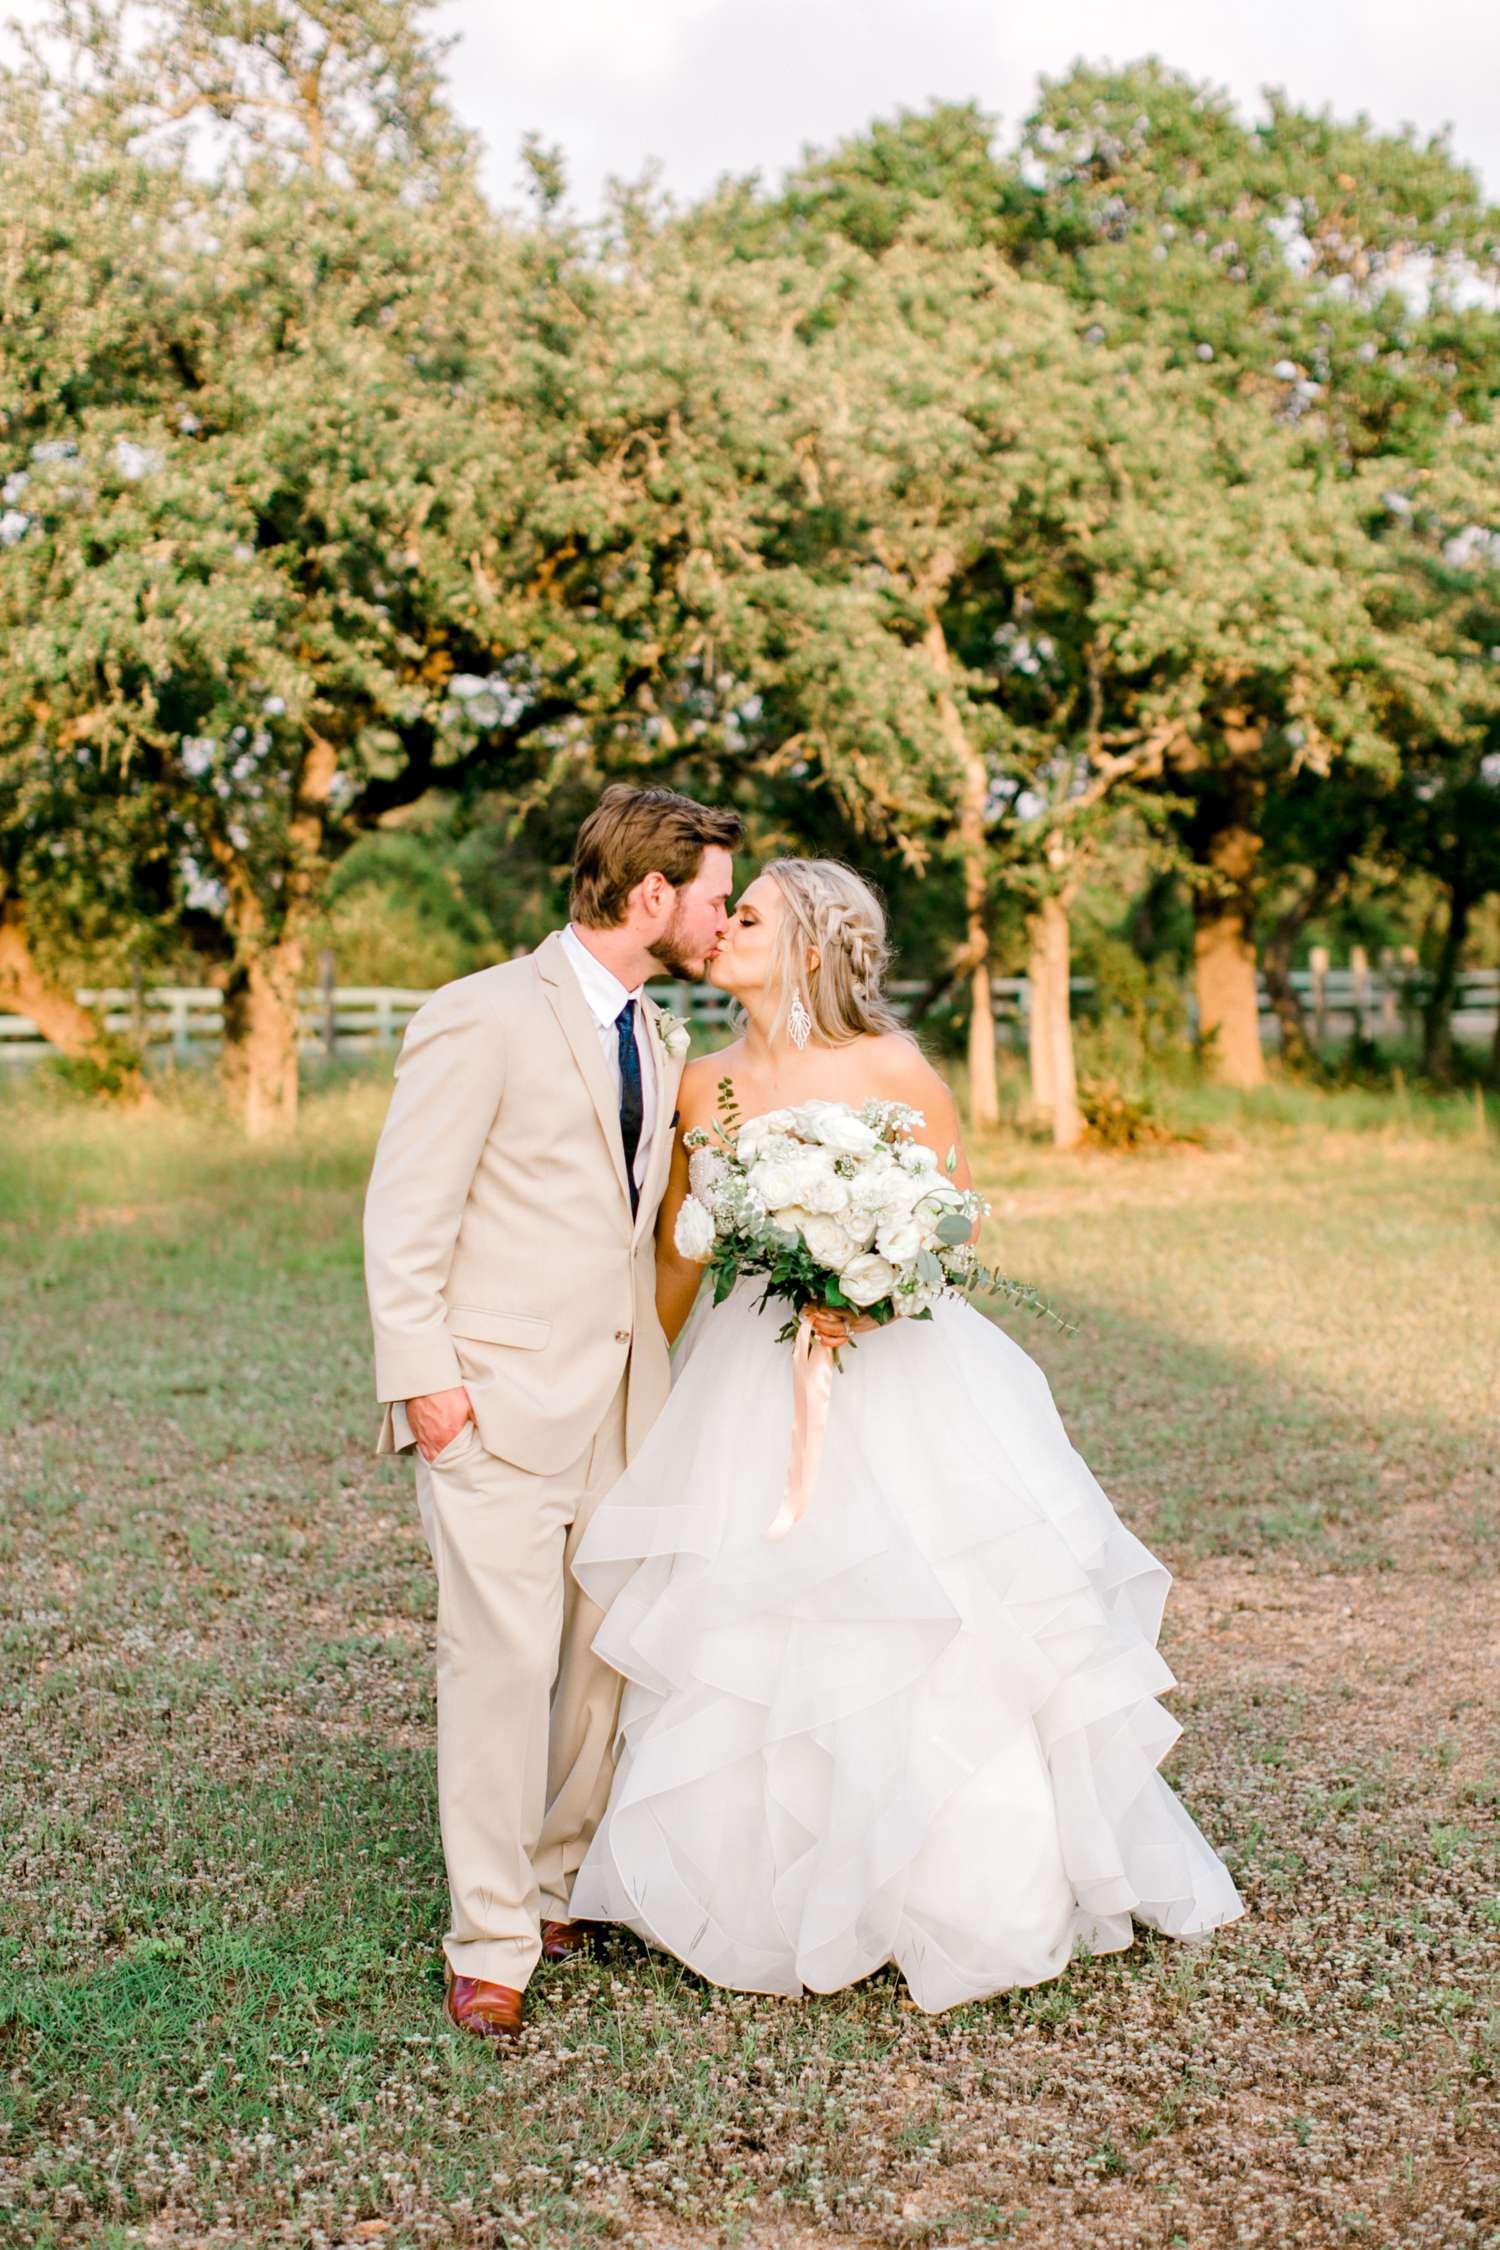 HAYLEE+JUSTIN+GREGORY+HERITAGE_HAUS_AUSTIN_TEXAS_WEDDING_0131.jpg